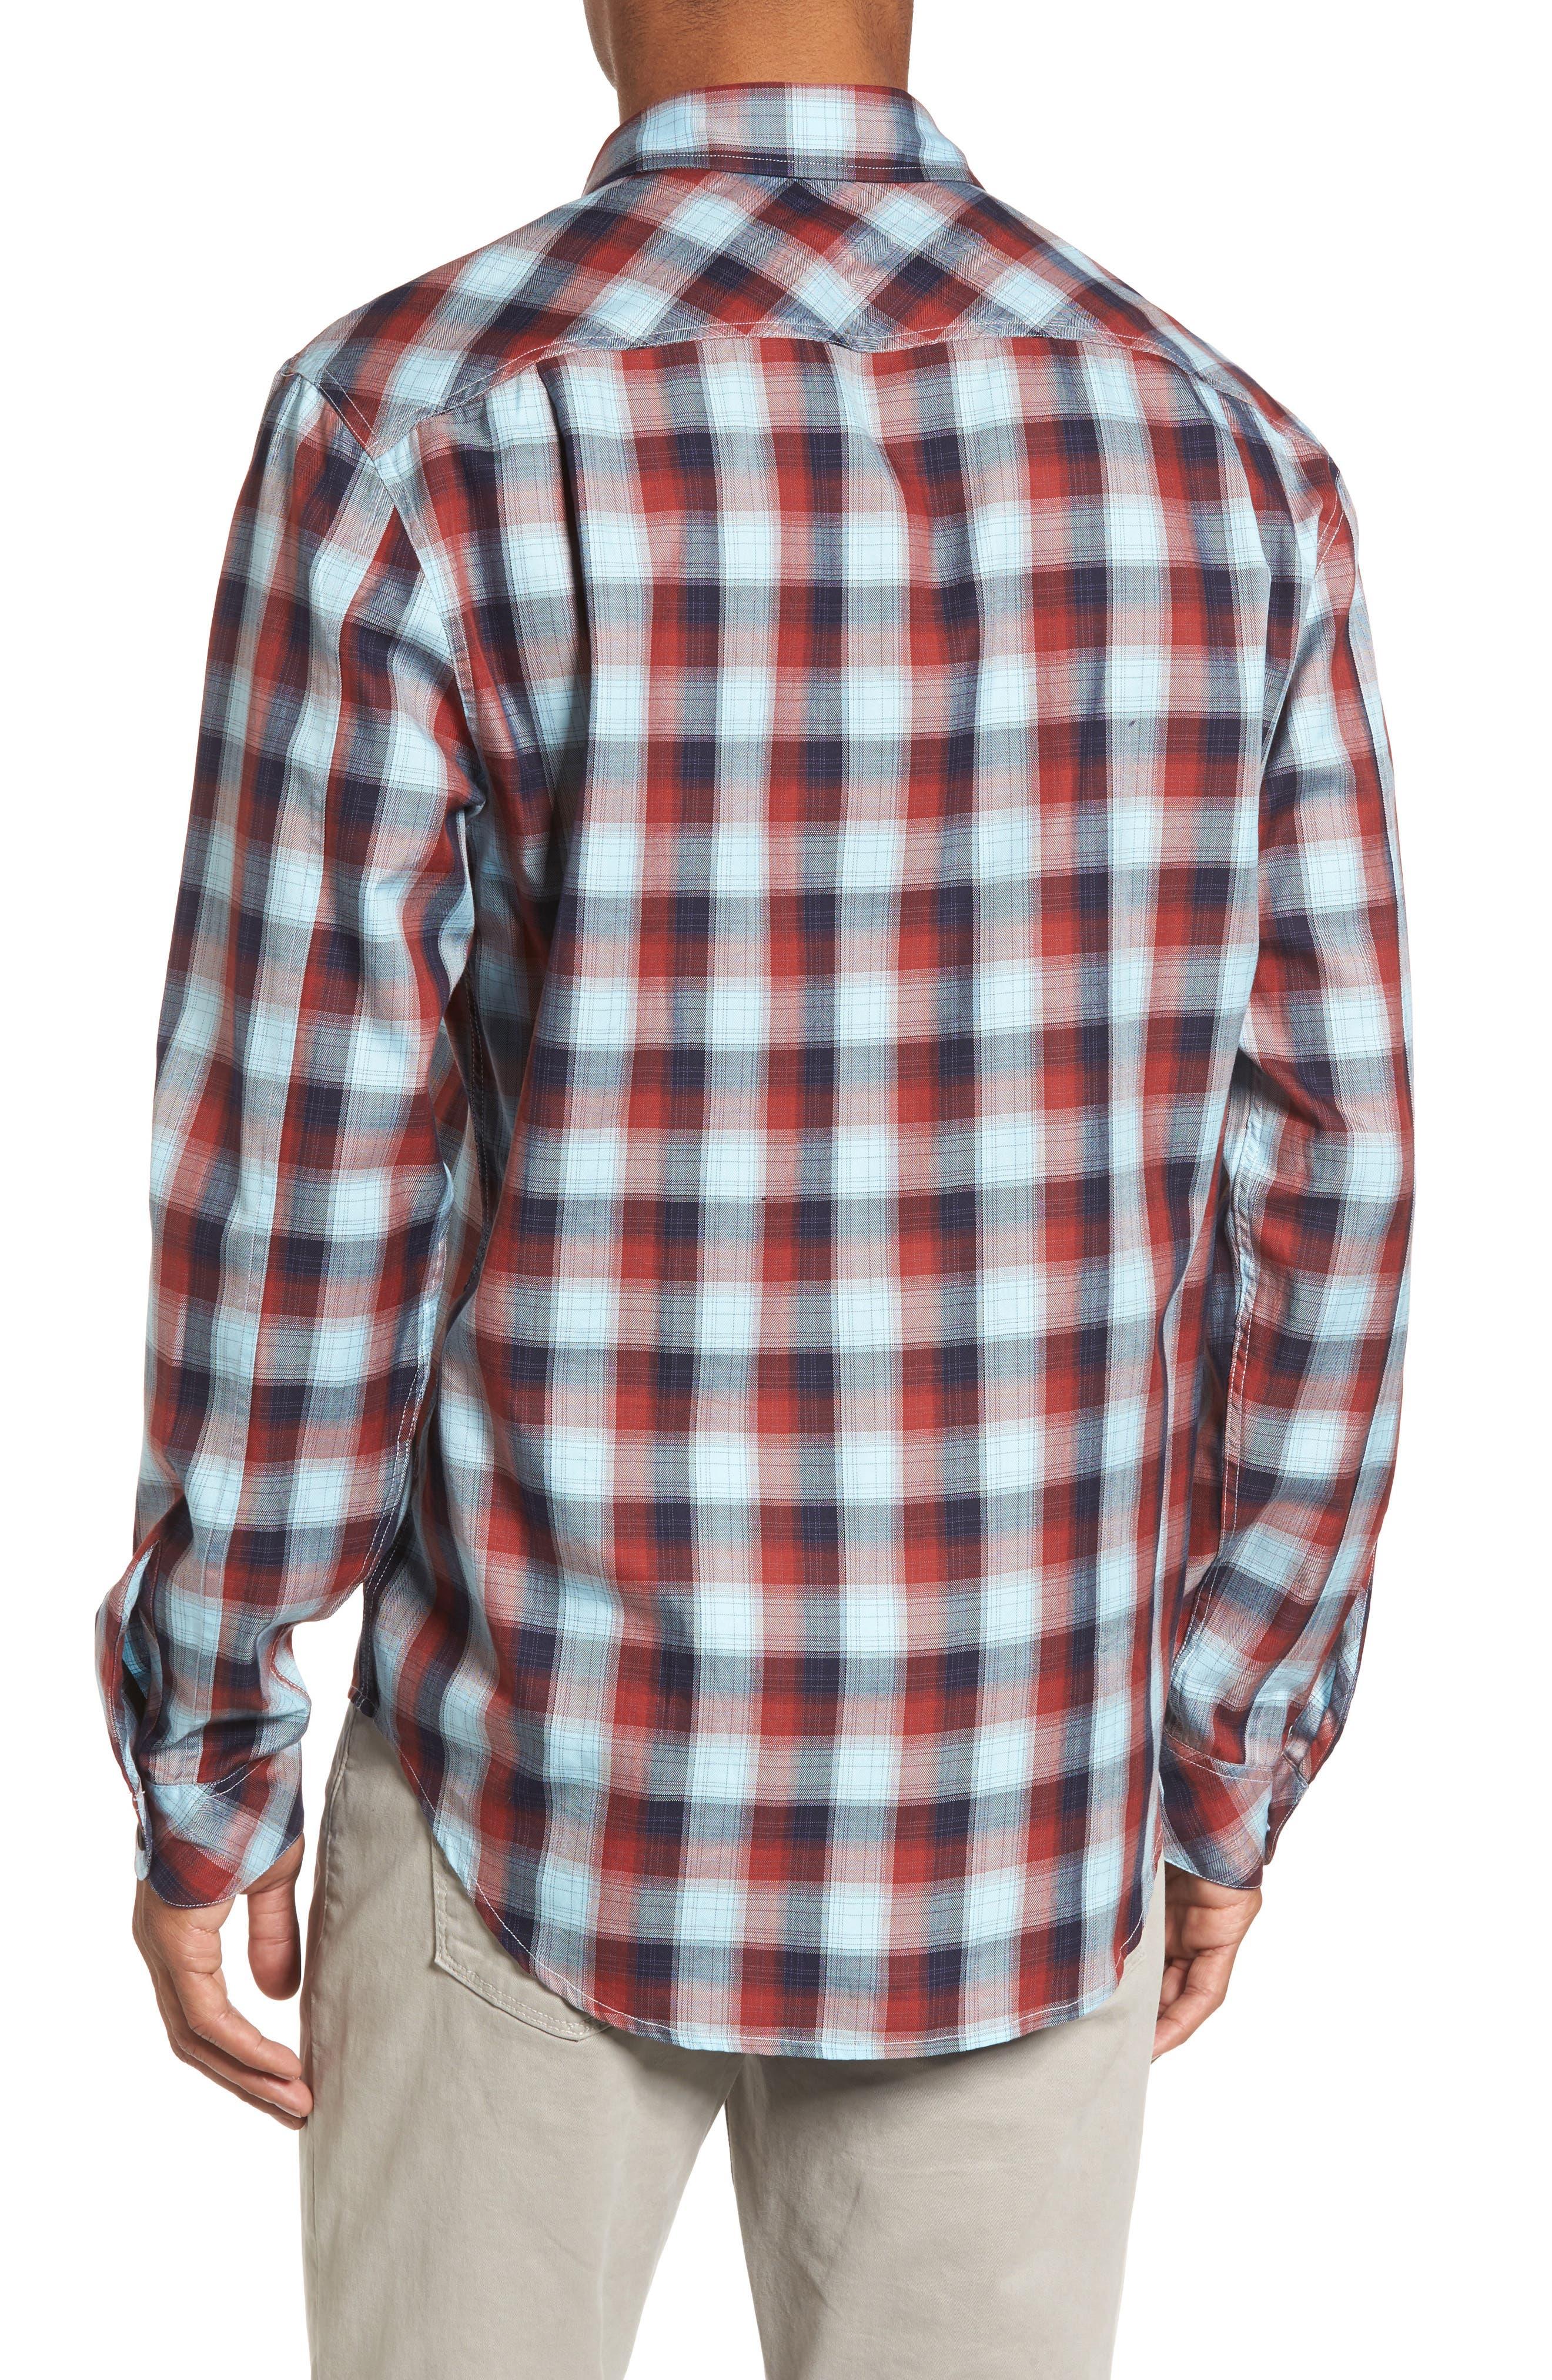 Alternate Image 2  - Coastaoro Redford Check Flannel Shirt